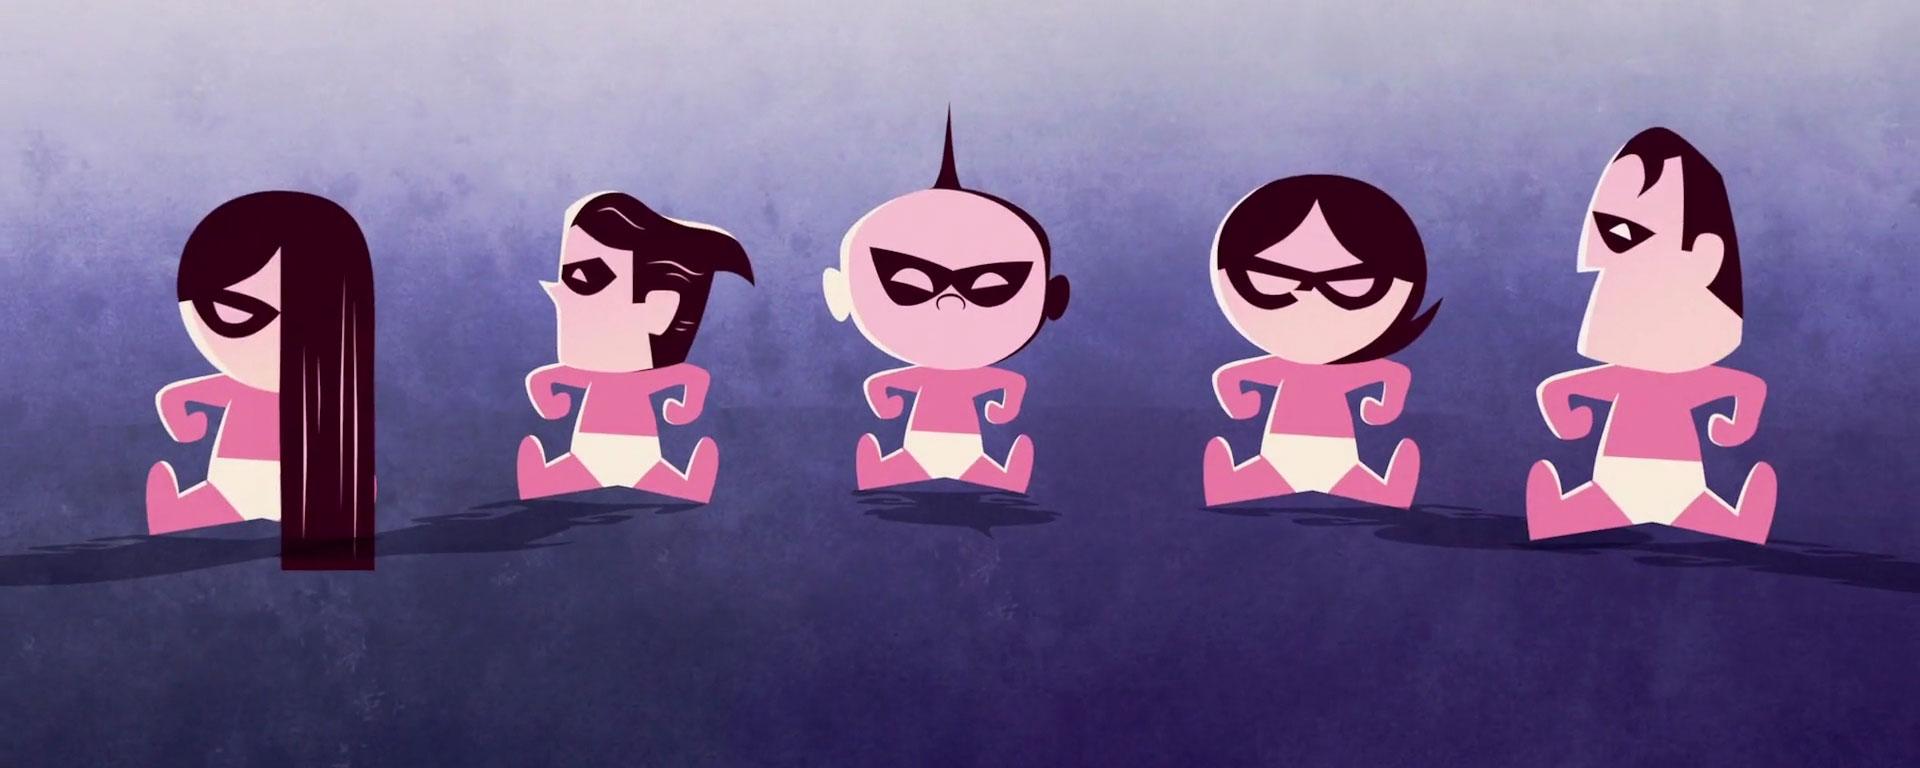 انیمیشن شگفت انگیزان ۲